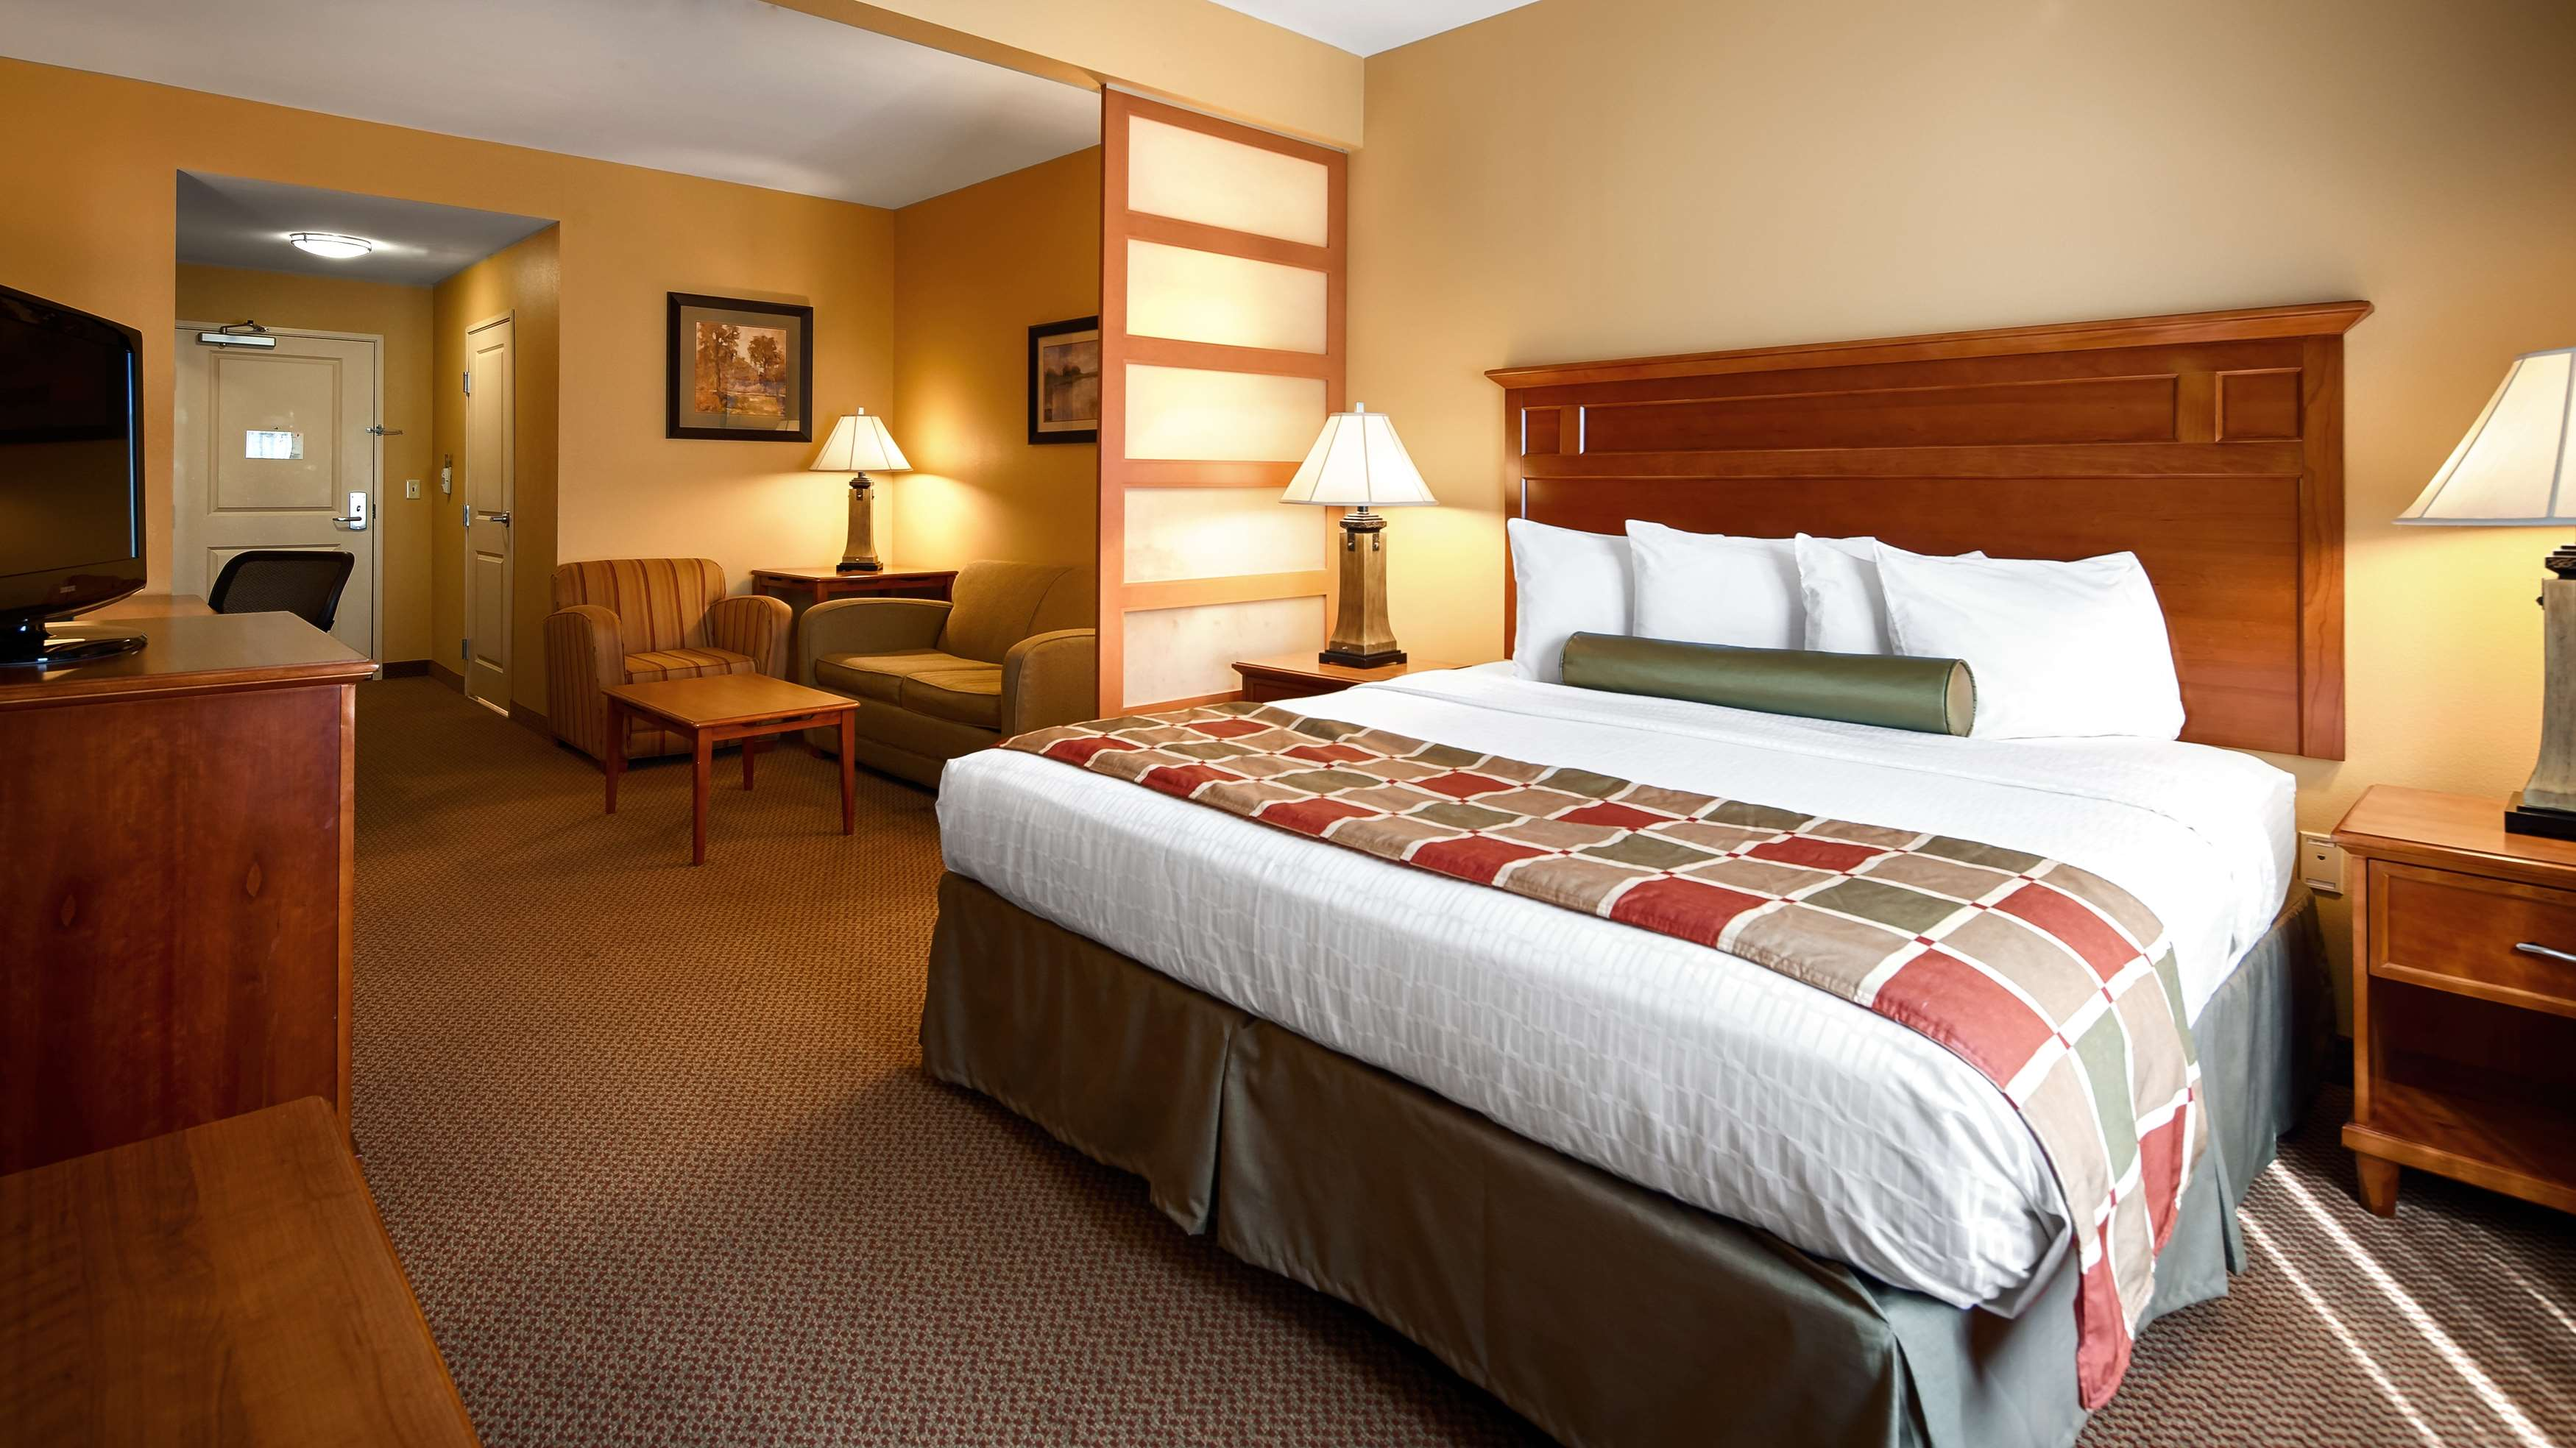 Best Western Plus University Park Inn & Suites image 11